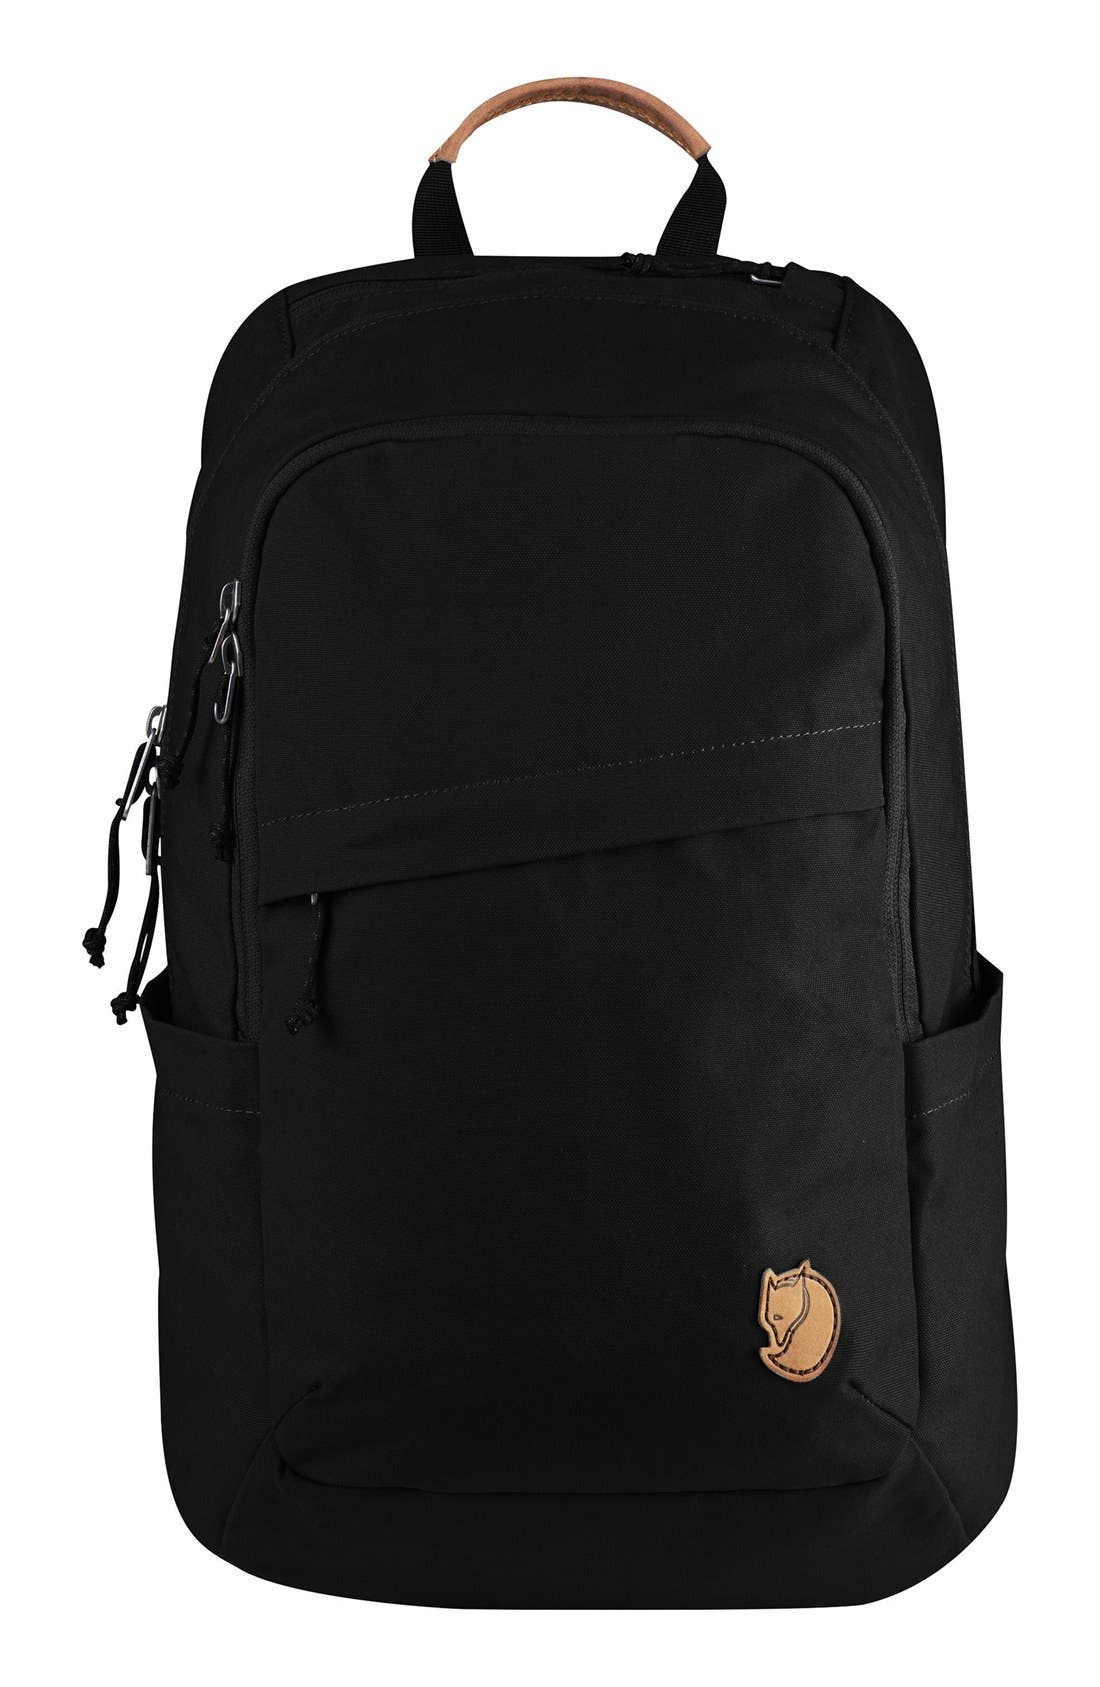 'Raven 20L' Backpack,                             Main thumbnail 1, color,                             001